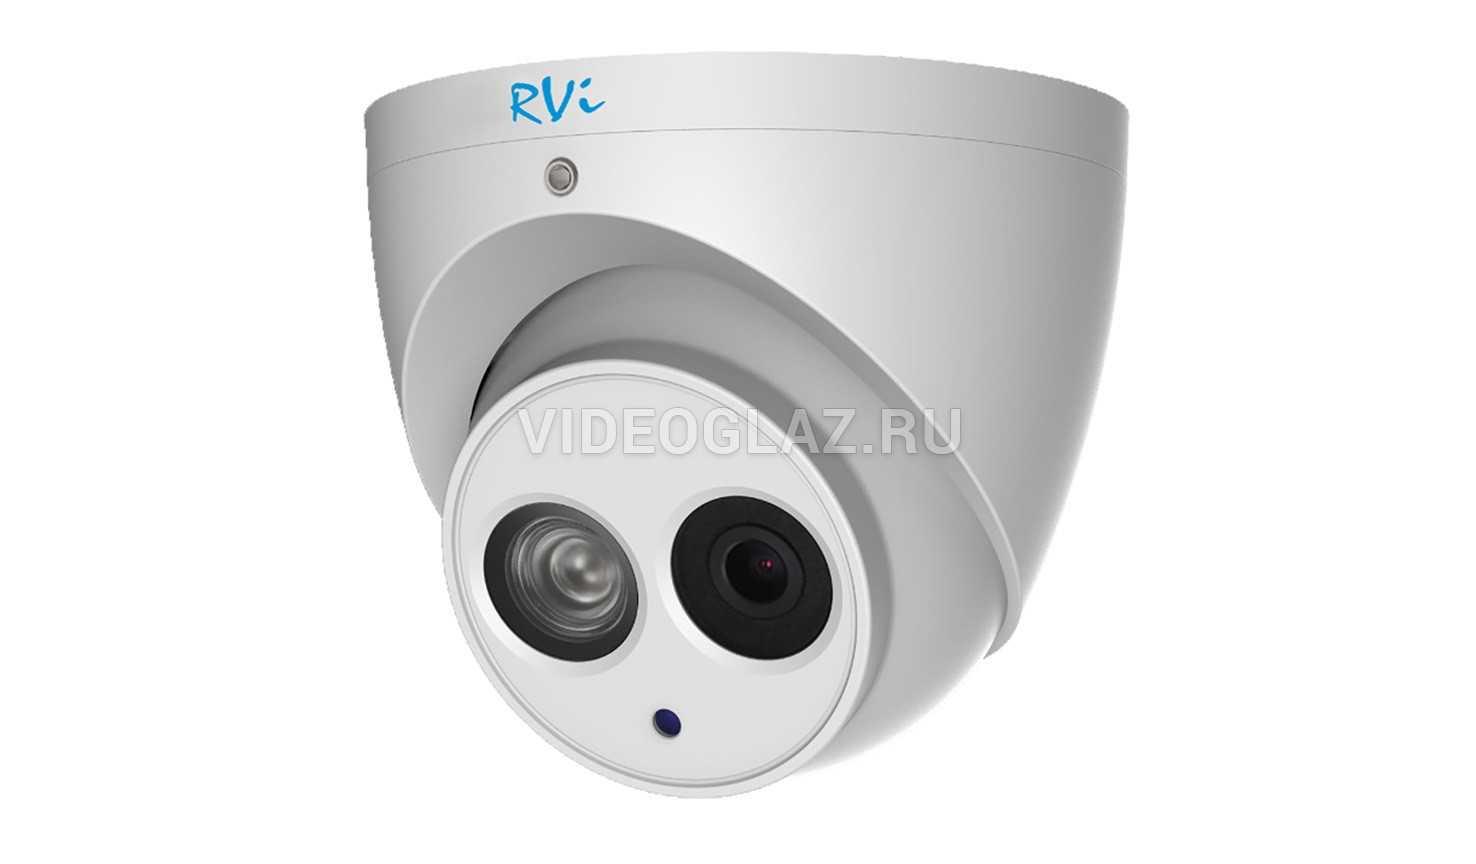 Видеокамера RVI-IPC34VD (2.8 мм)